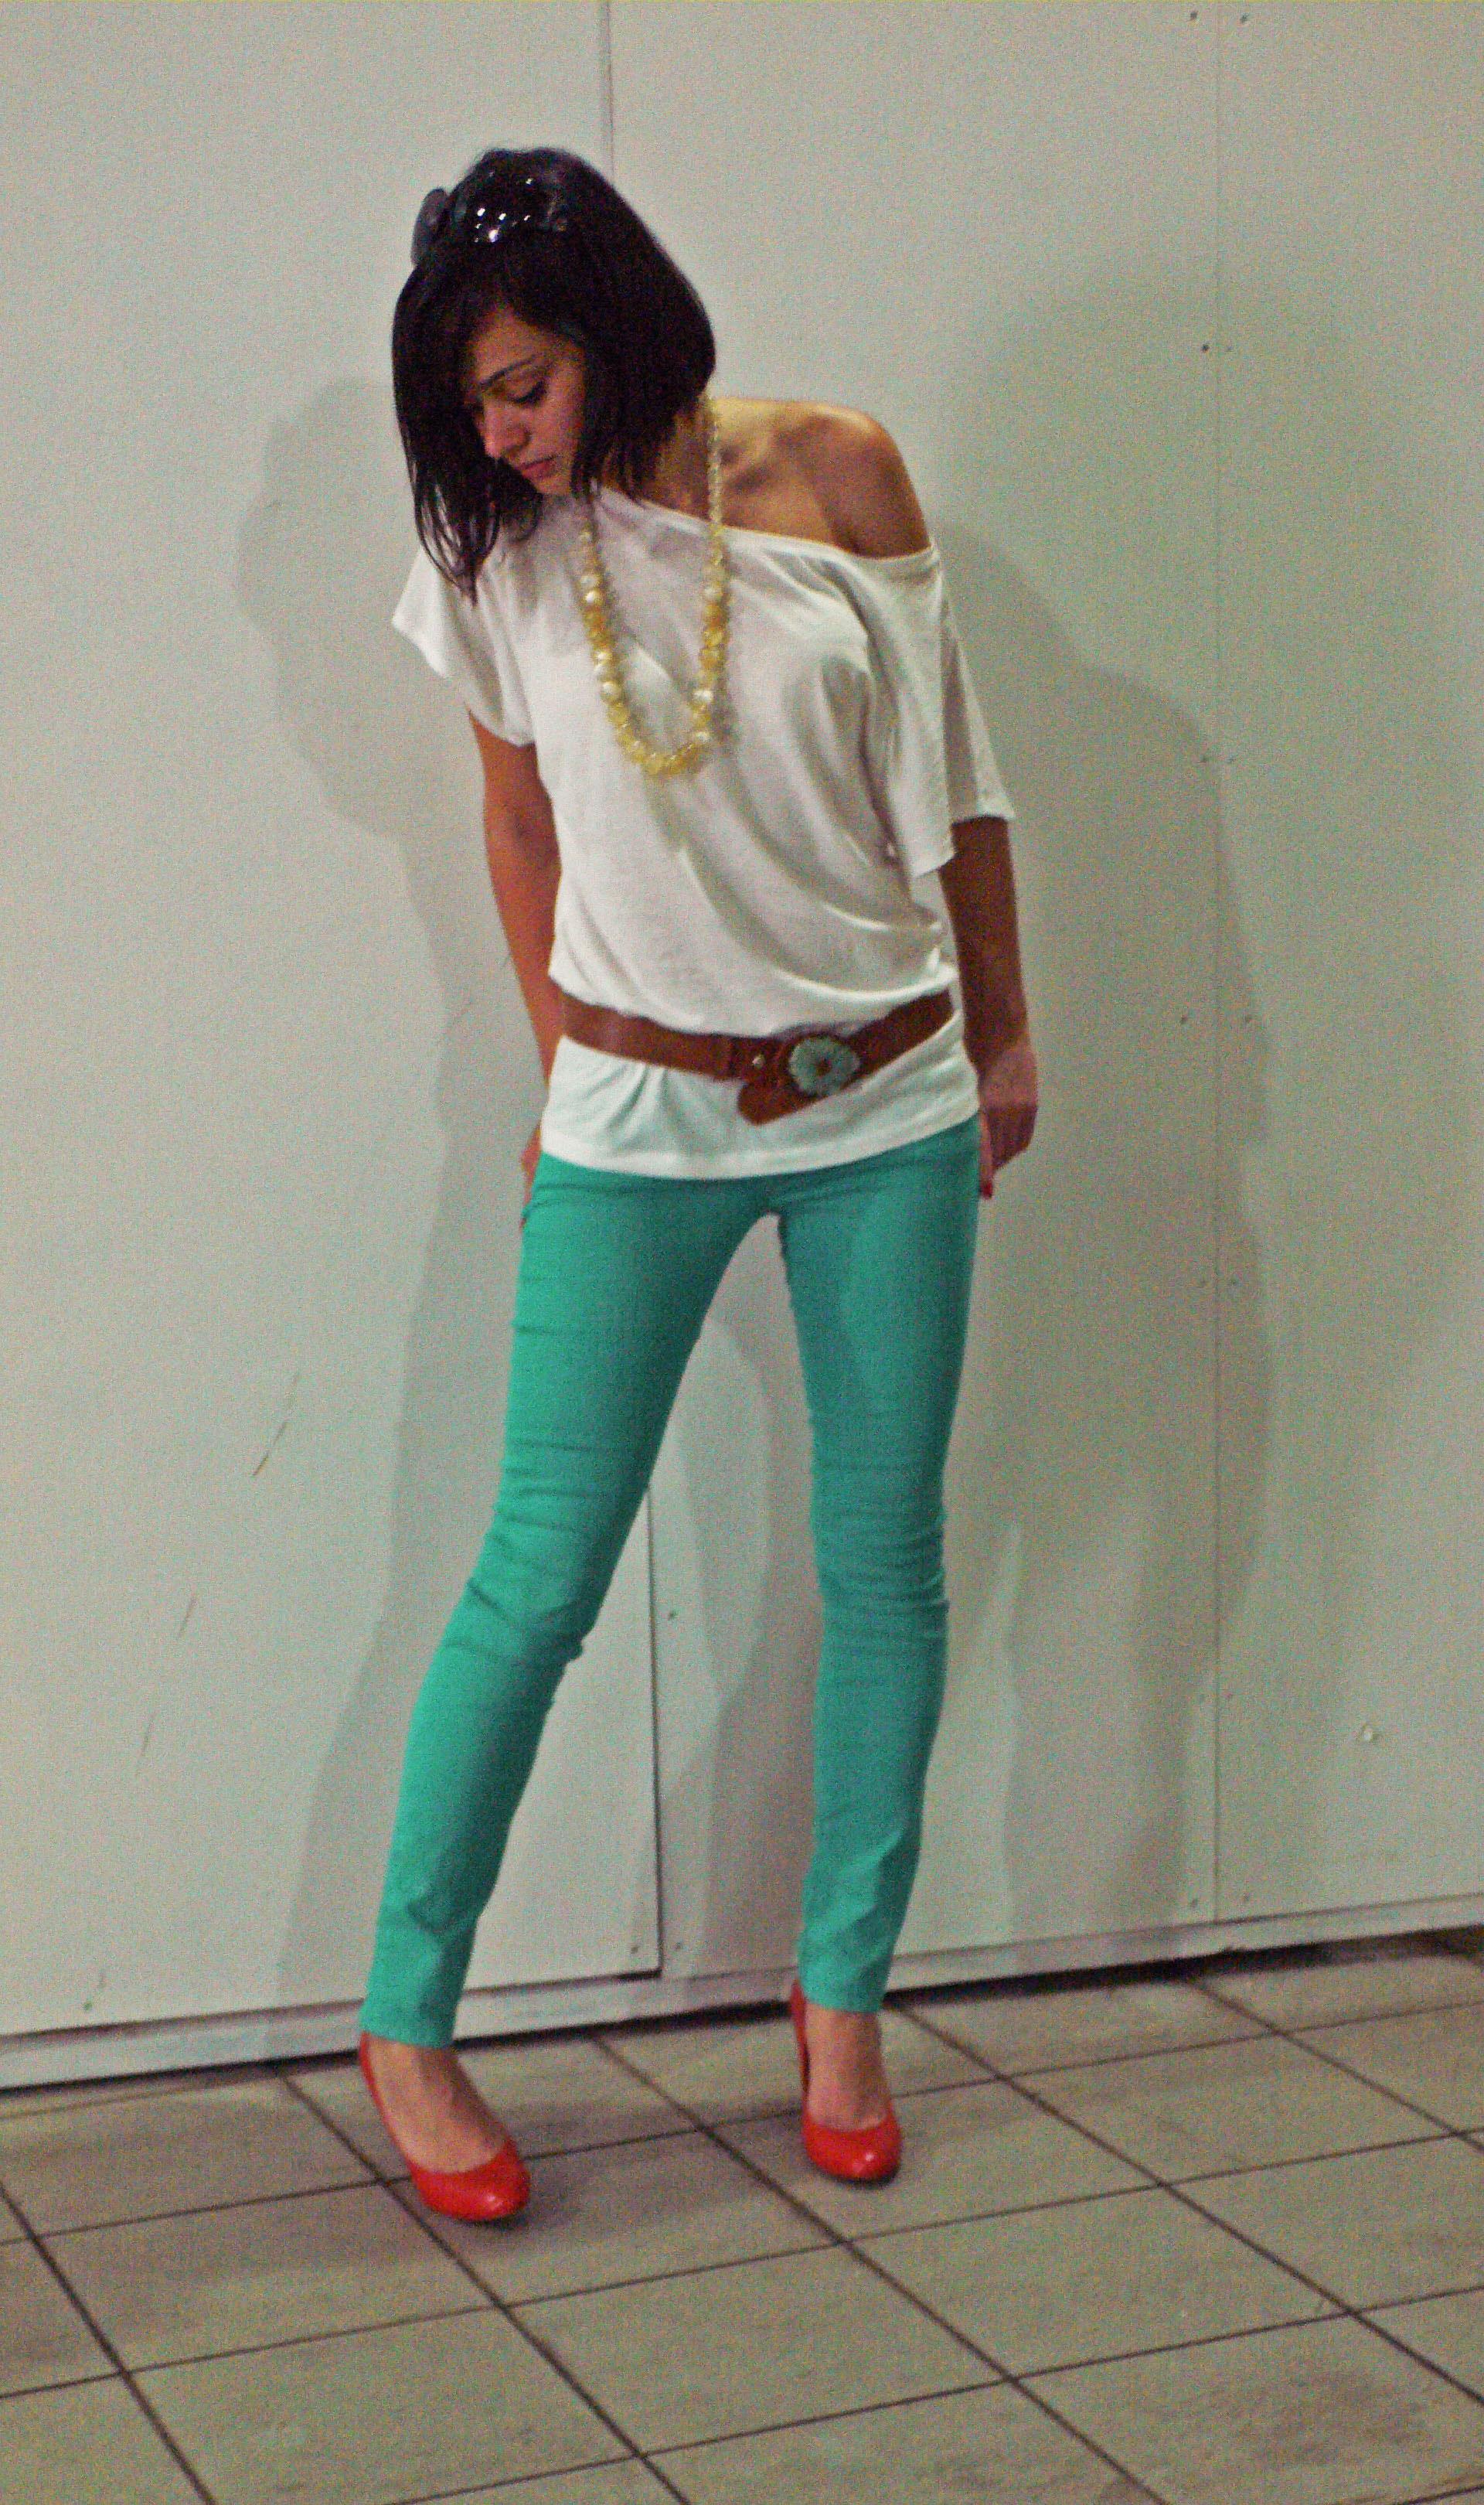 Mavi Jeans Images TheCelebrityPix 1920x3240